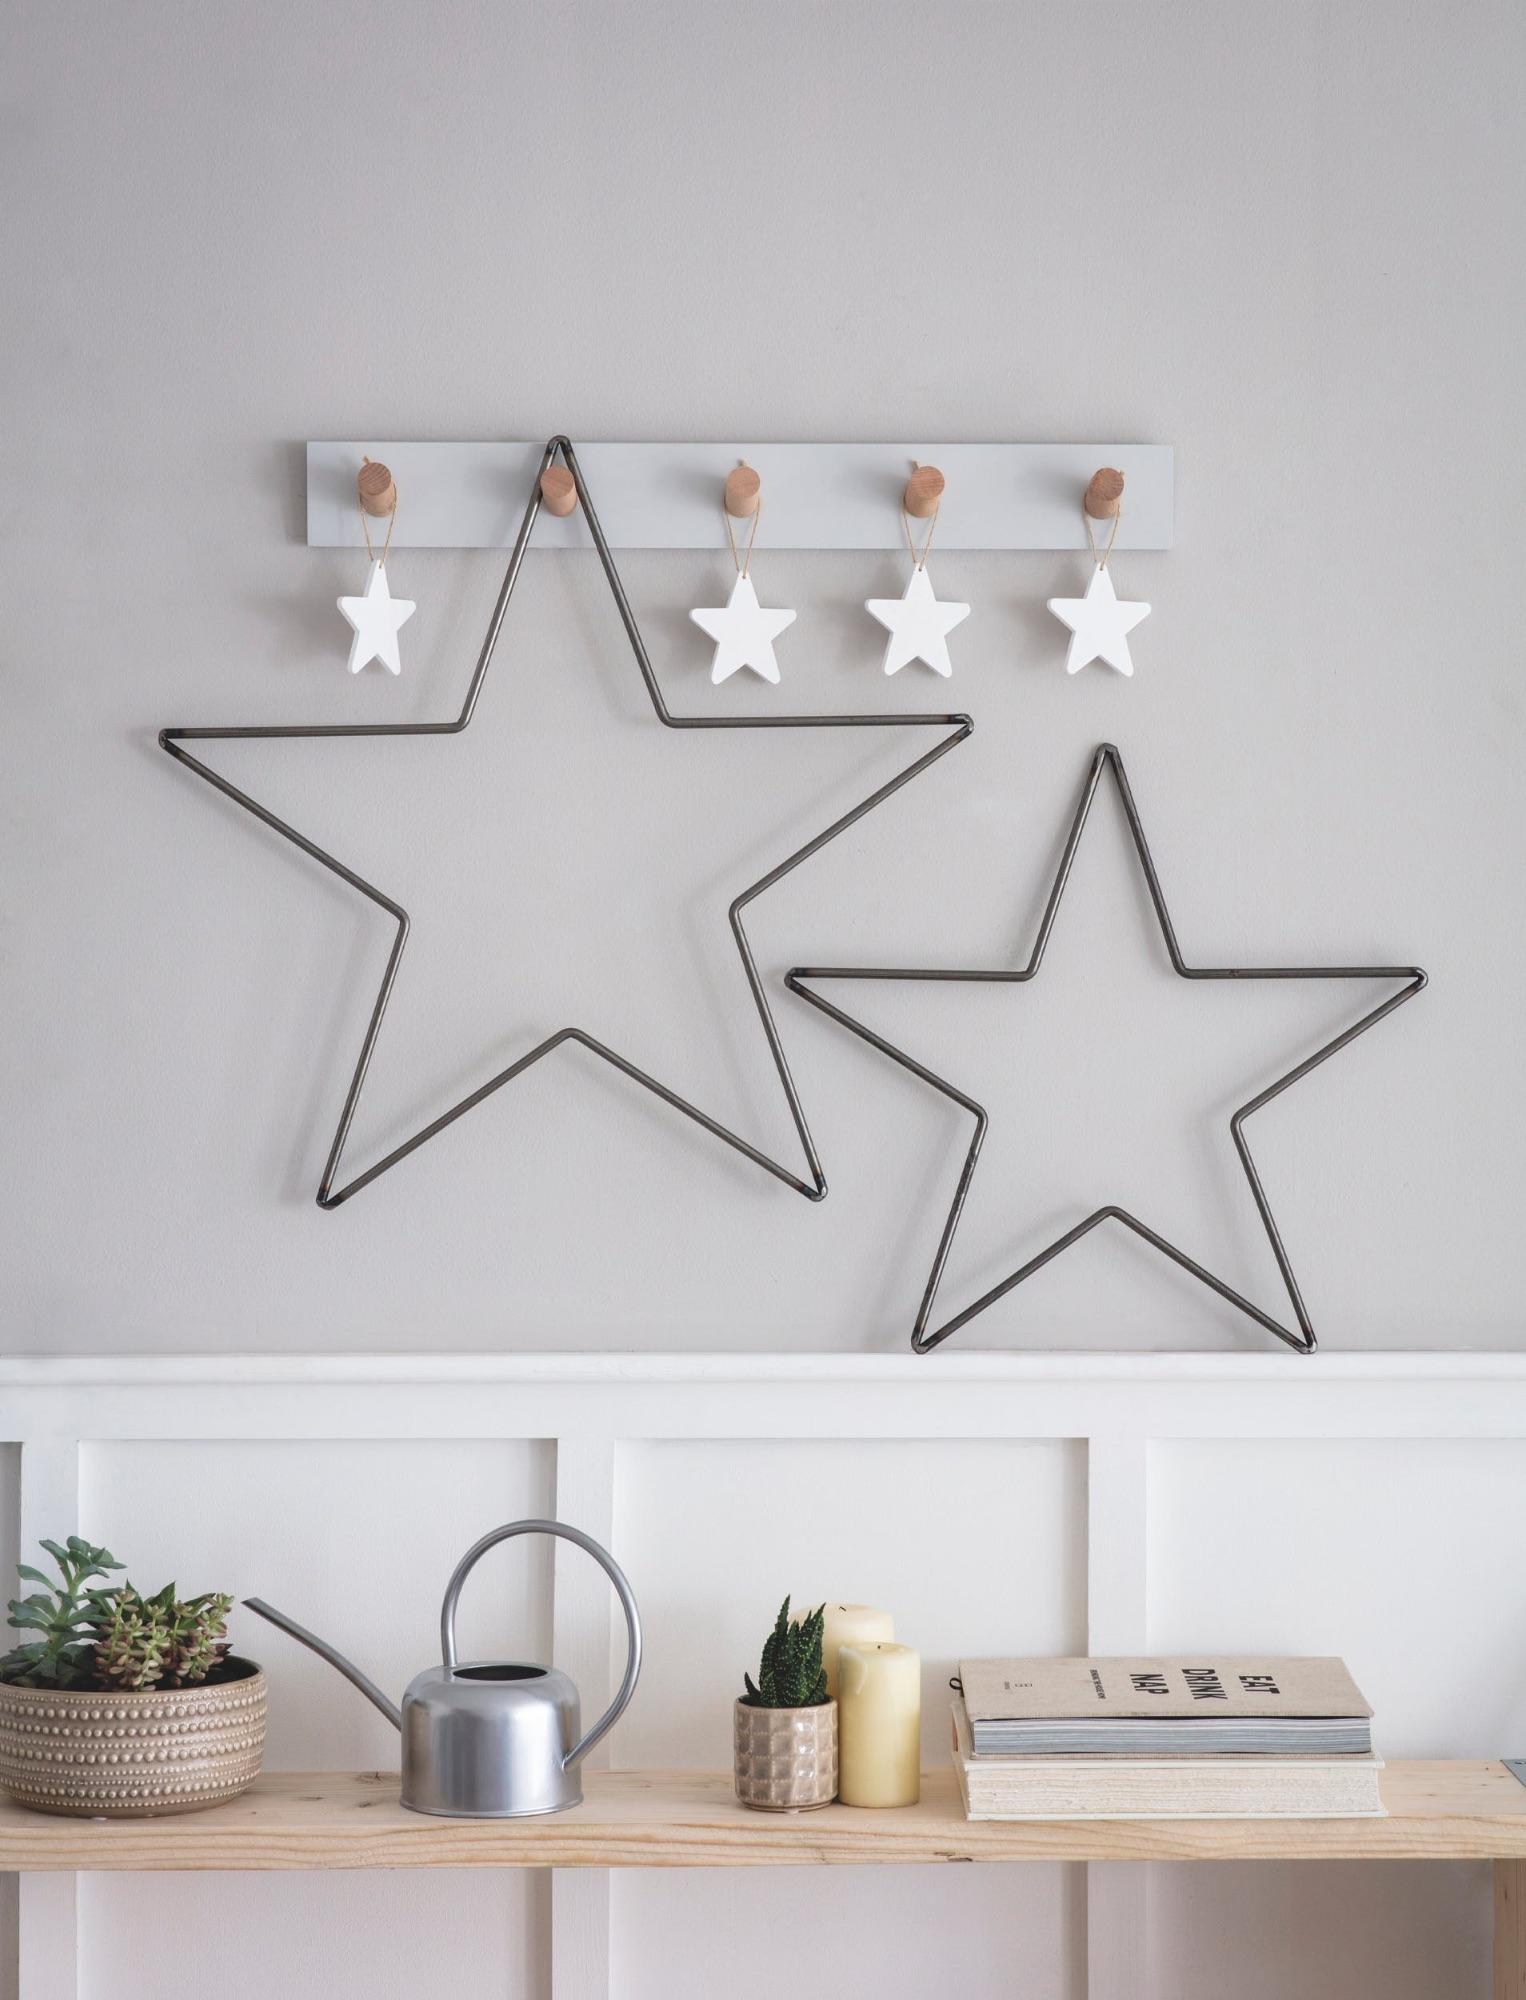 garden trading Farringdon Star set